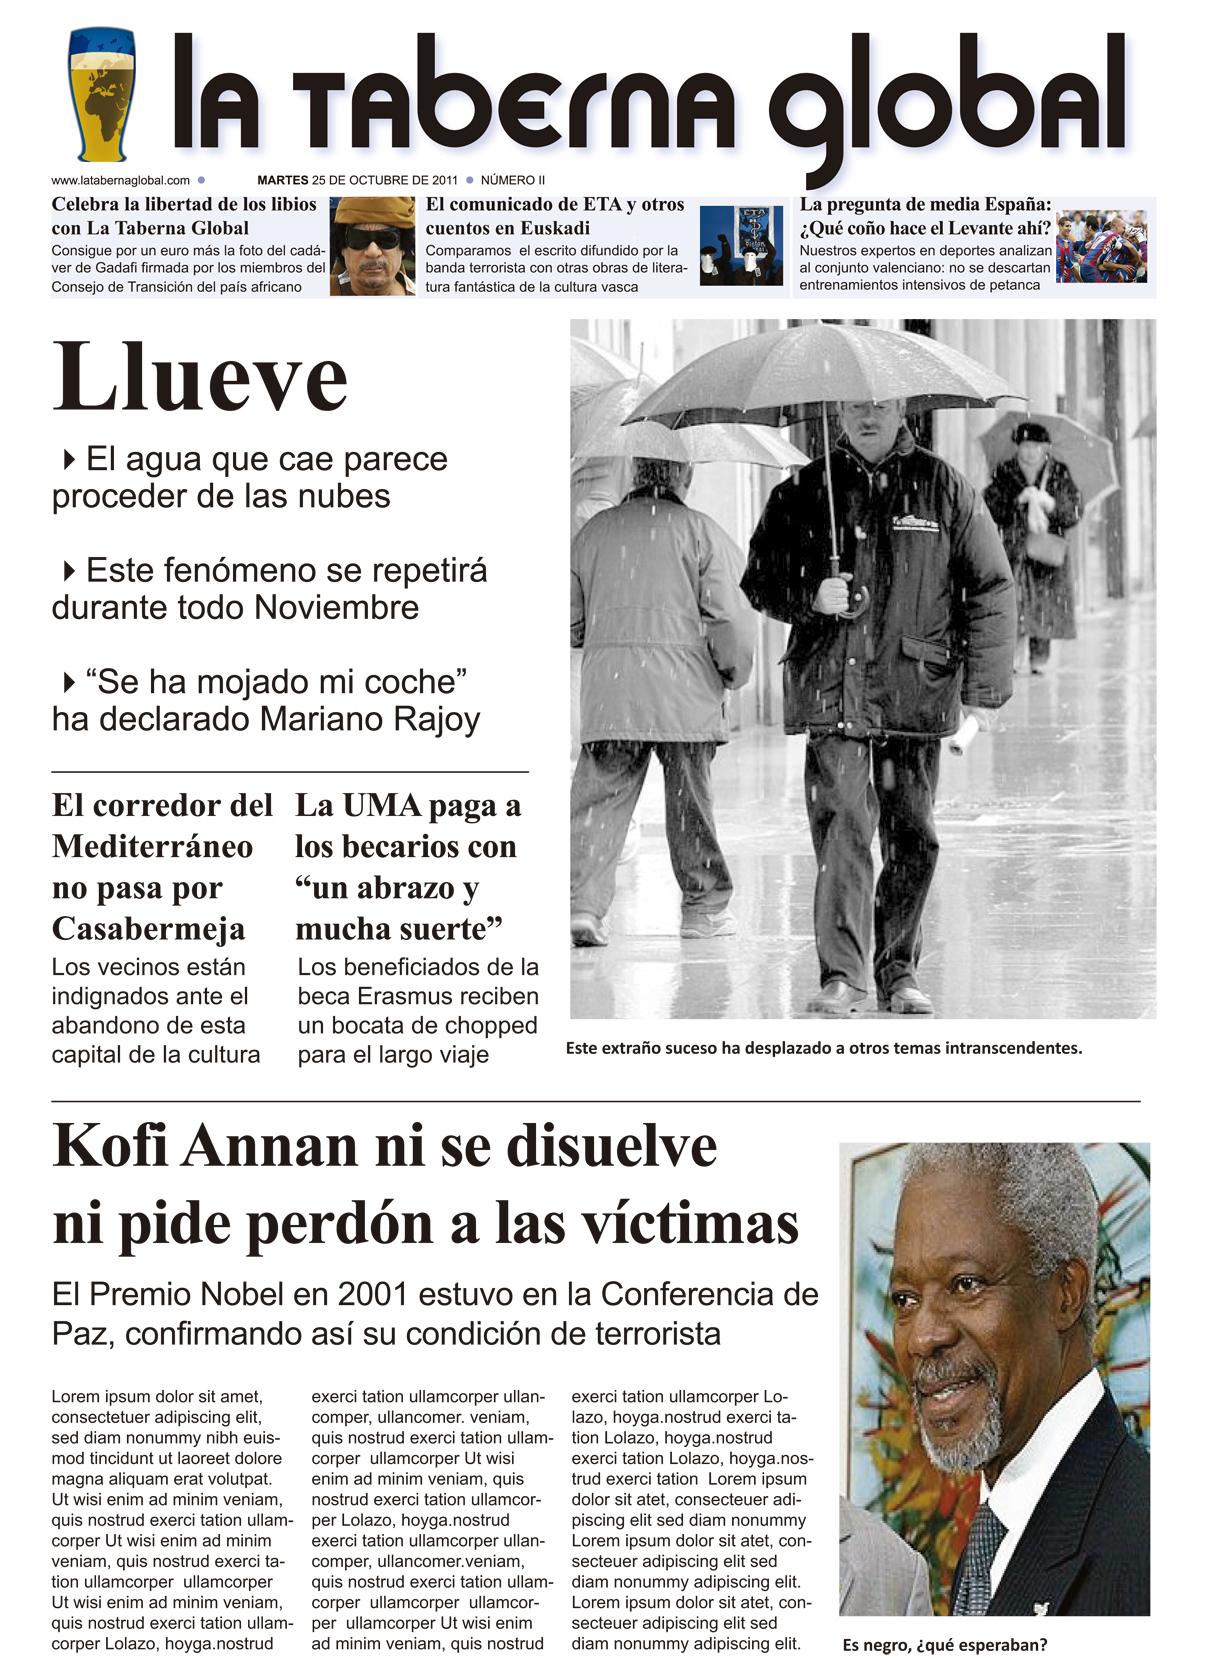 La portada satírica de LTG 25/10/11